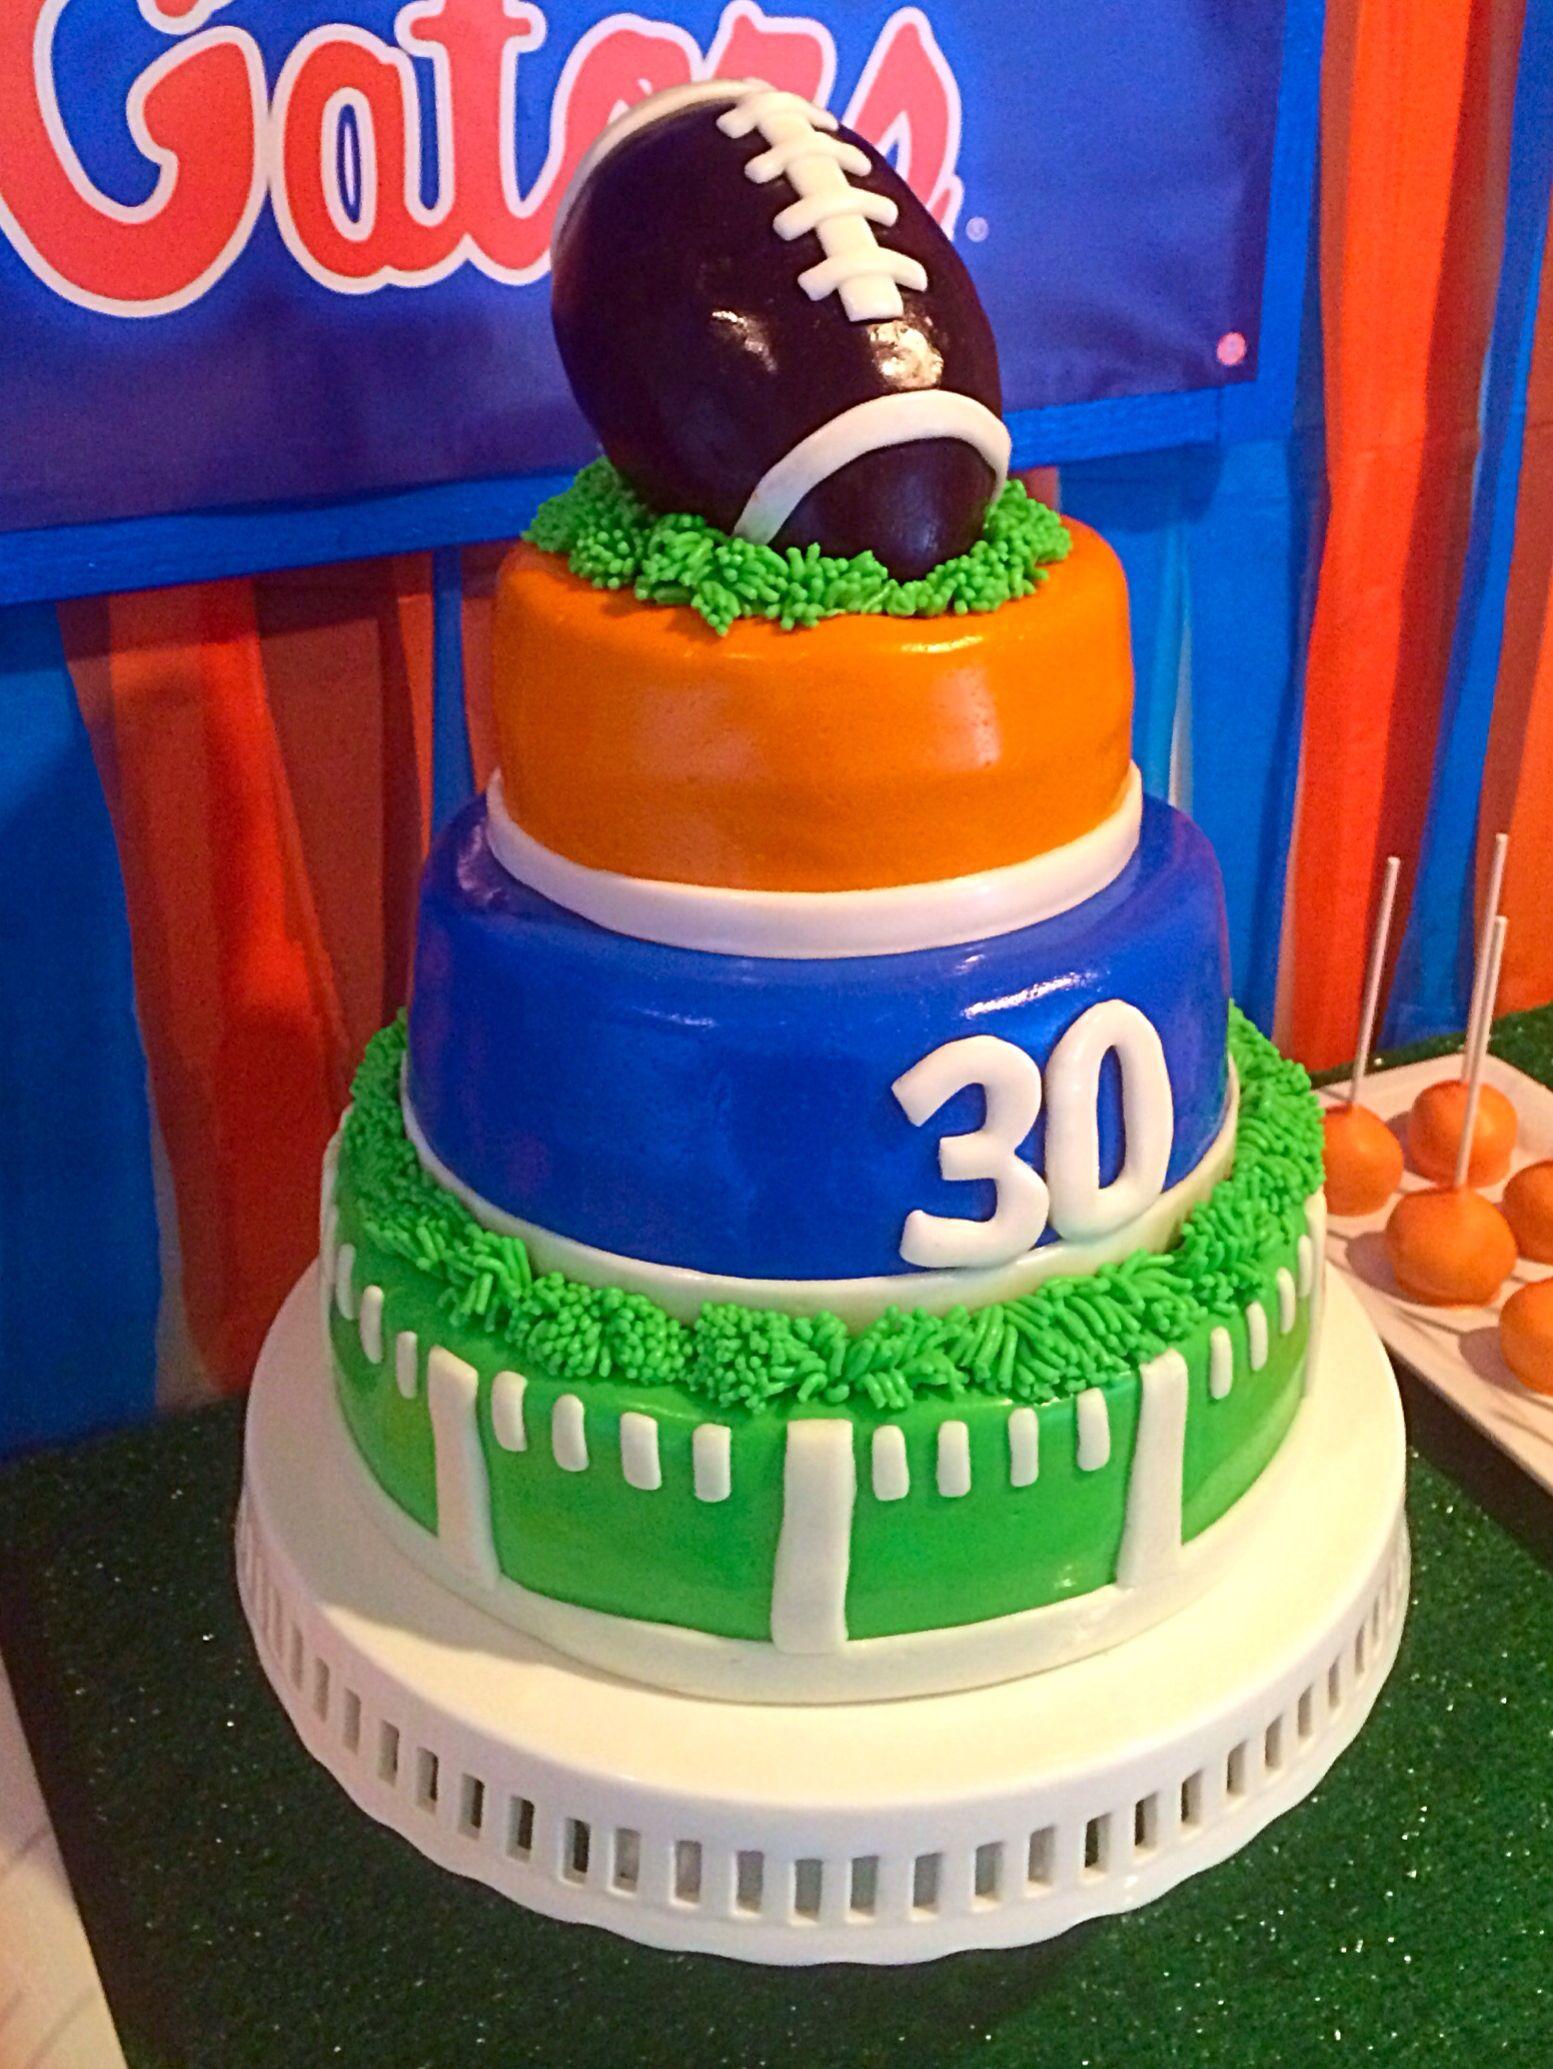 Football Birthday Cake With Fondant Florida Gators 30th Birthday